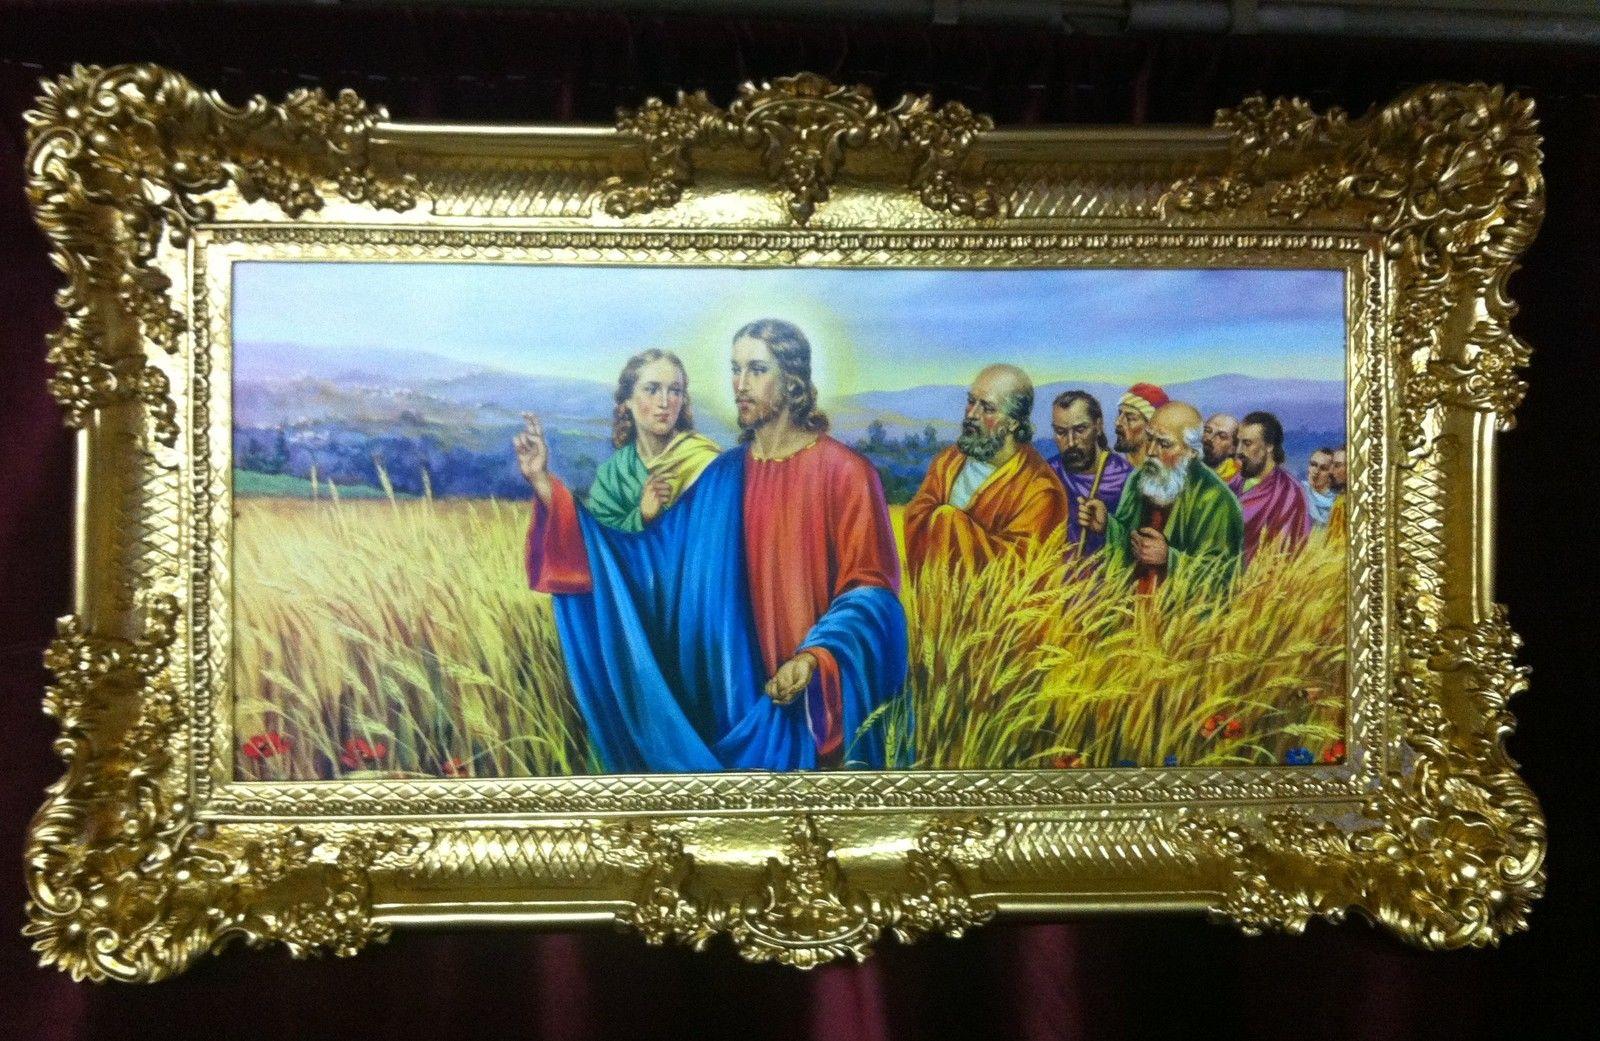 Jesus Christus Bild Heilige Bild Gerahmte Gemälde Bilder Rahmen ...